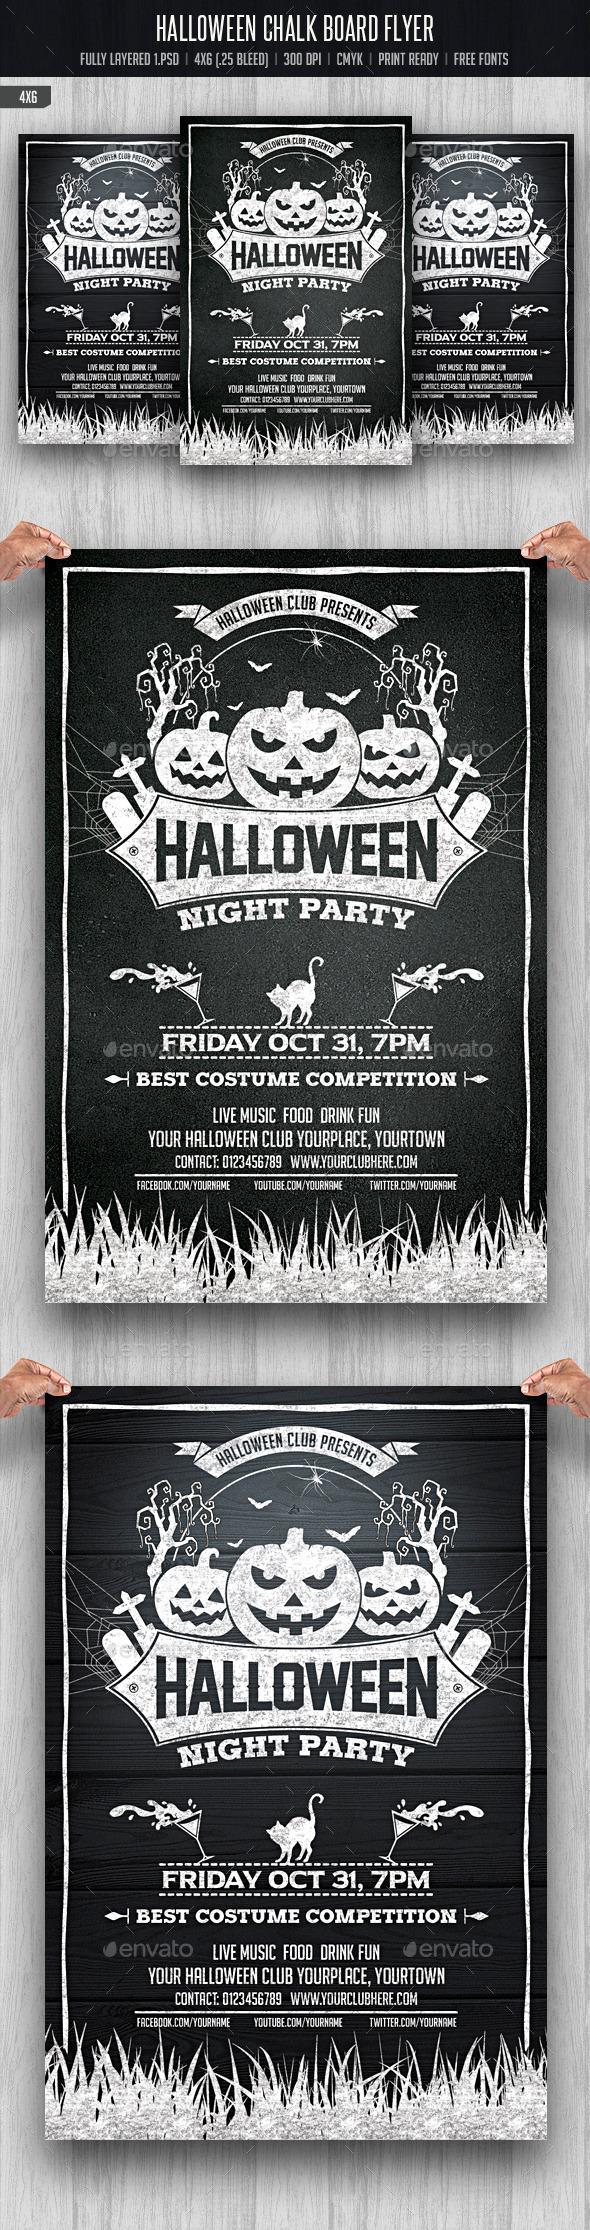 Halloween Chalkboard Flyer - Events Flyers